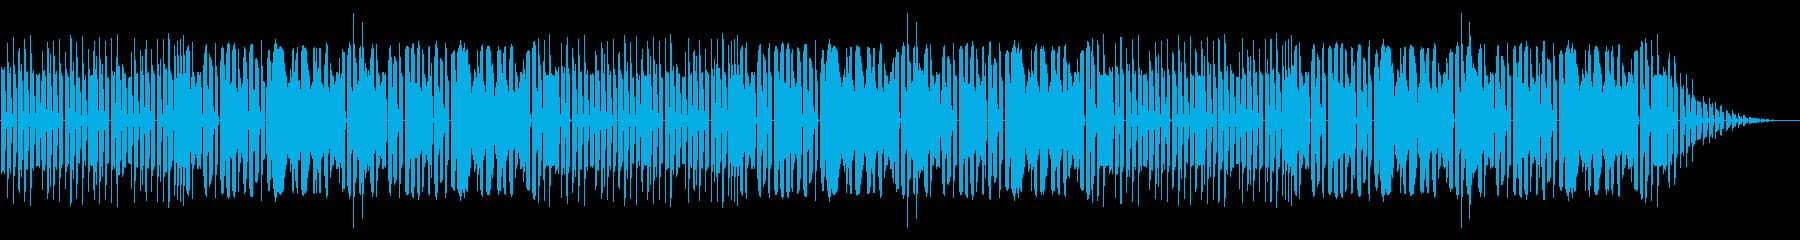 NES RPG B07-1(フィールド1の再生済みの波形